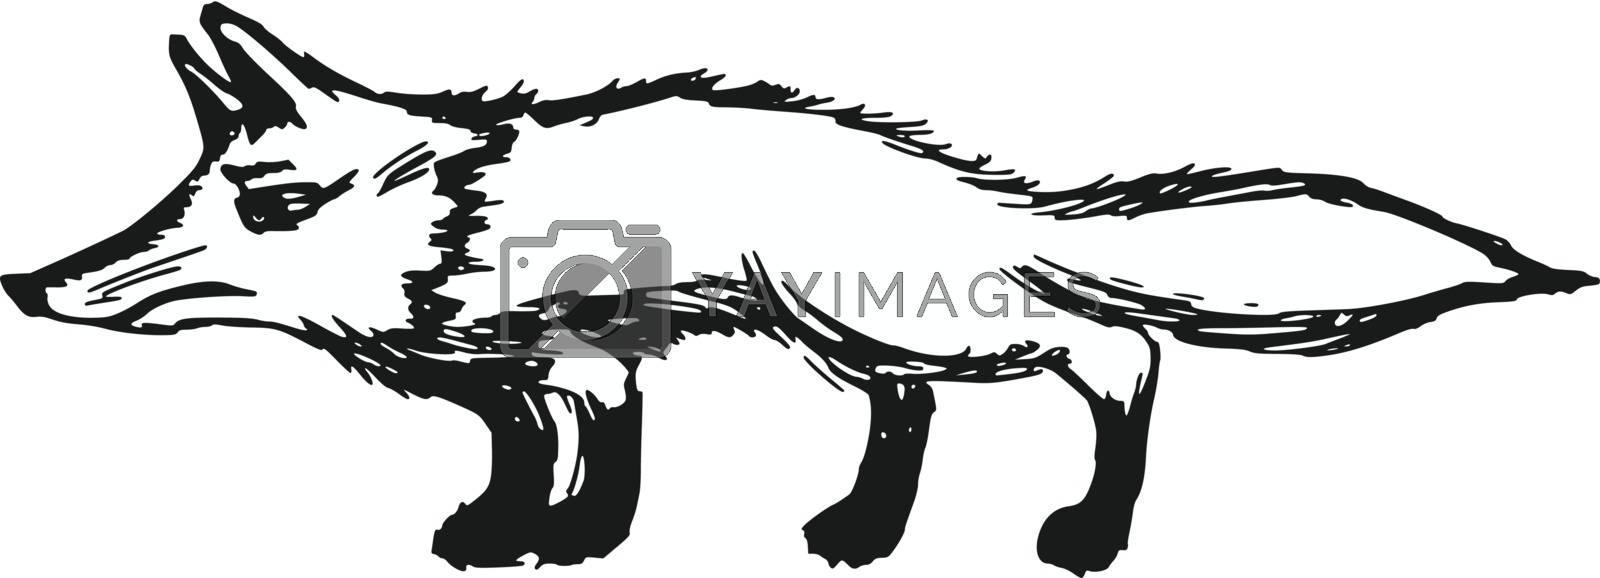 hand drawn, sketch, cartoon illustration of red fox